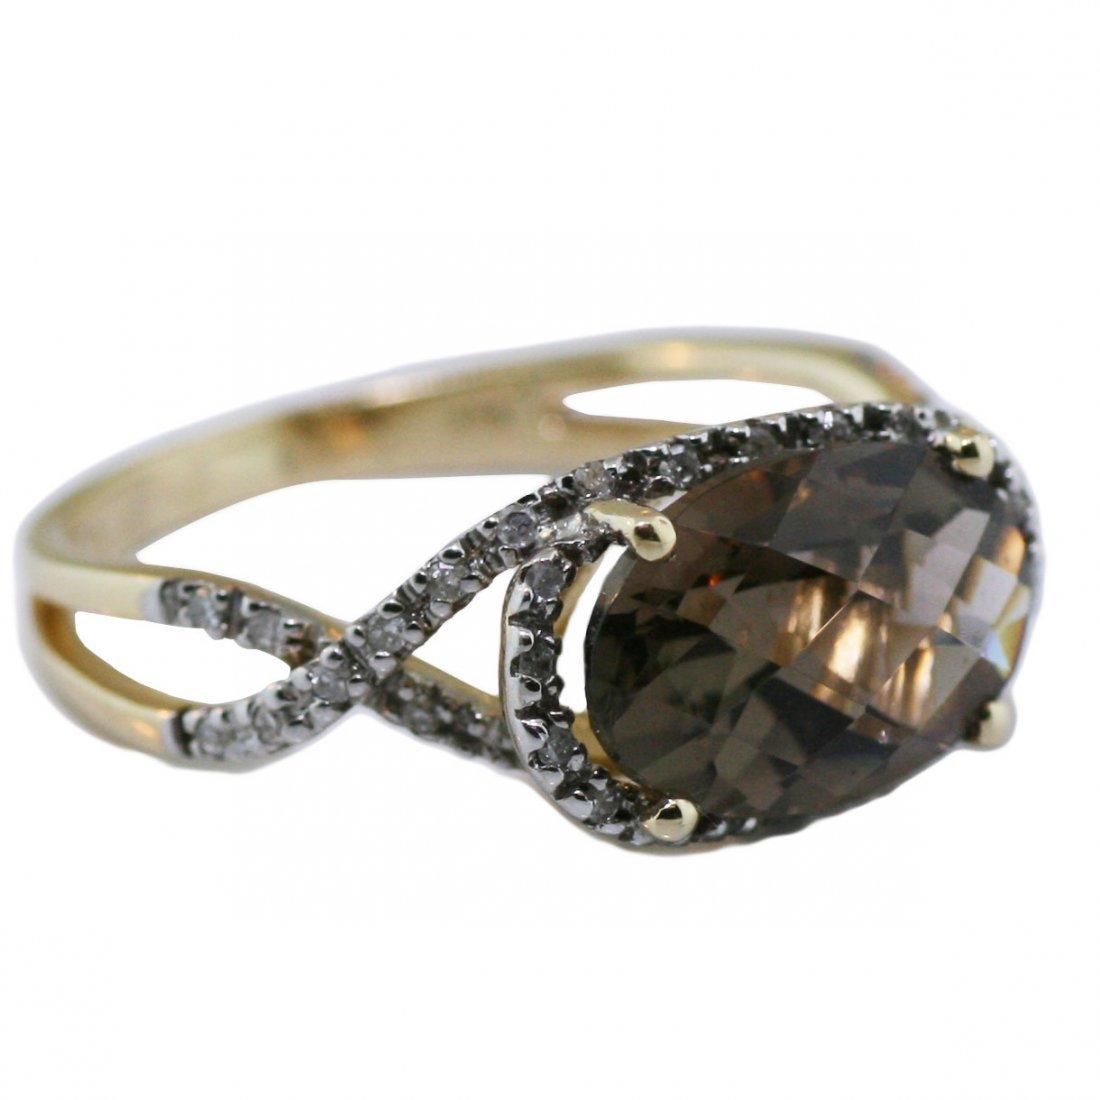 14K Gold Ring & Pave Diamonds With Smokey Topaz Video!